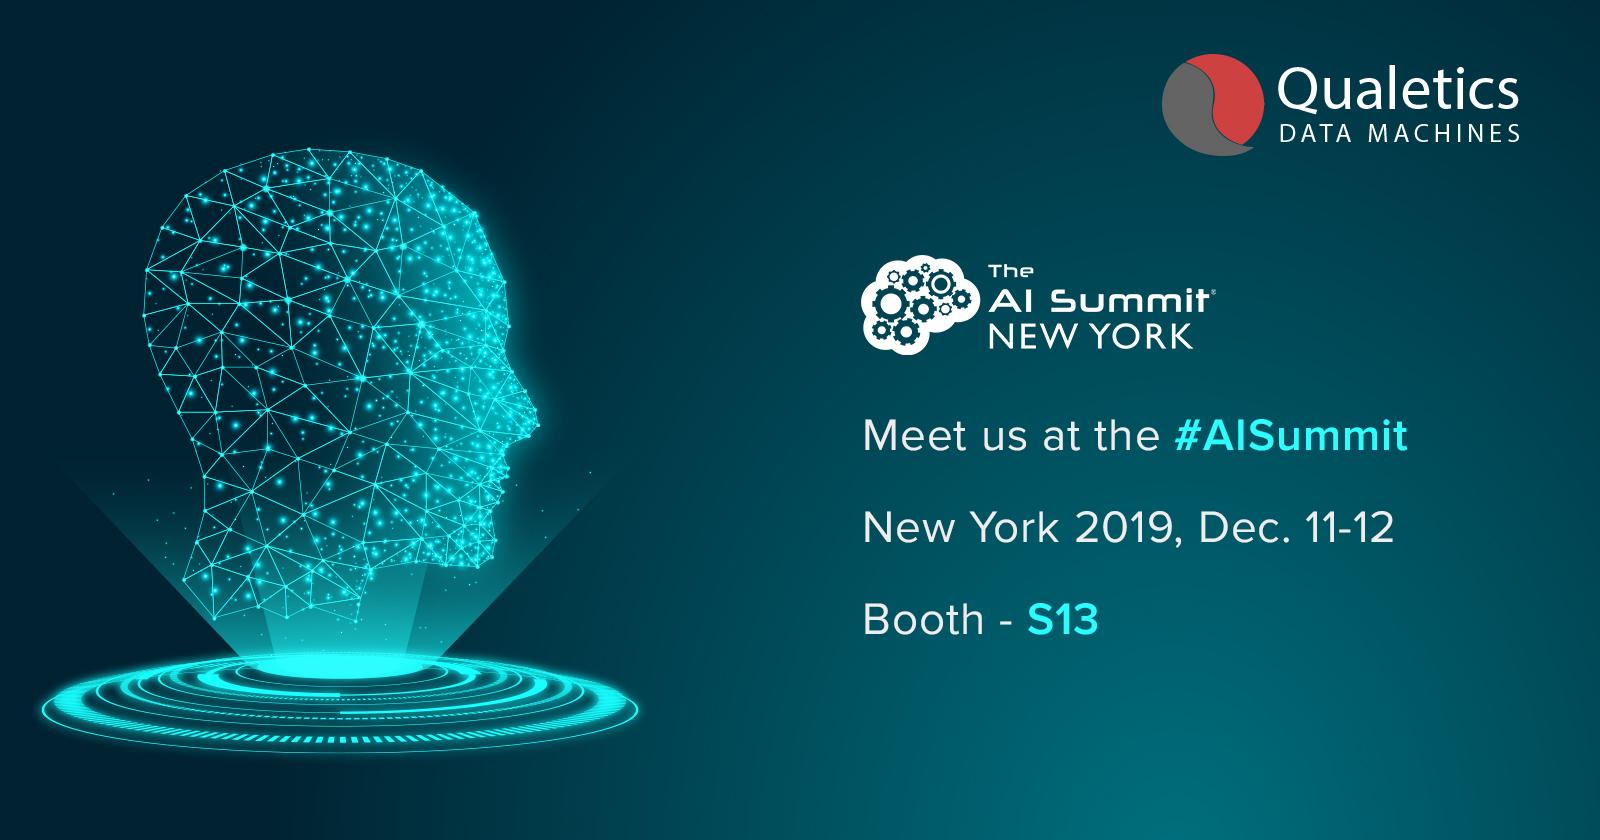 Meet Us at #AISummit, 2019, New York